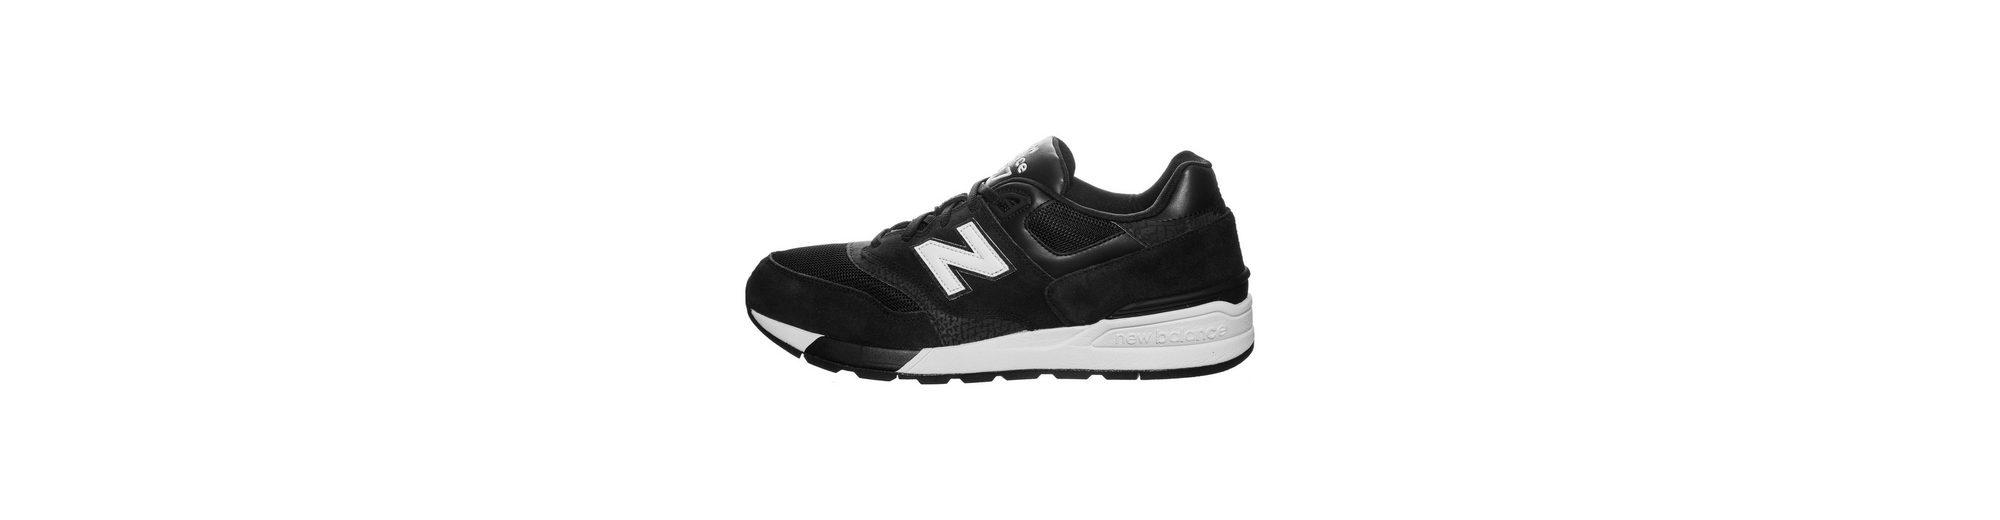 New Balance ML597-AAC-D Sneaker Herren Verkauf Des Niedrigen Preises Online mu0VxVL